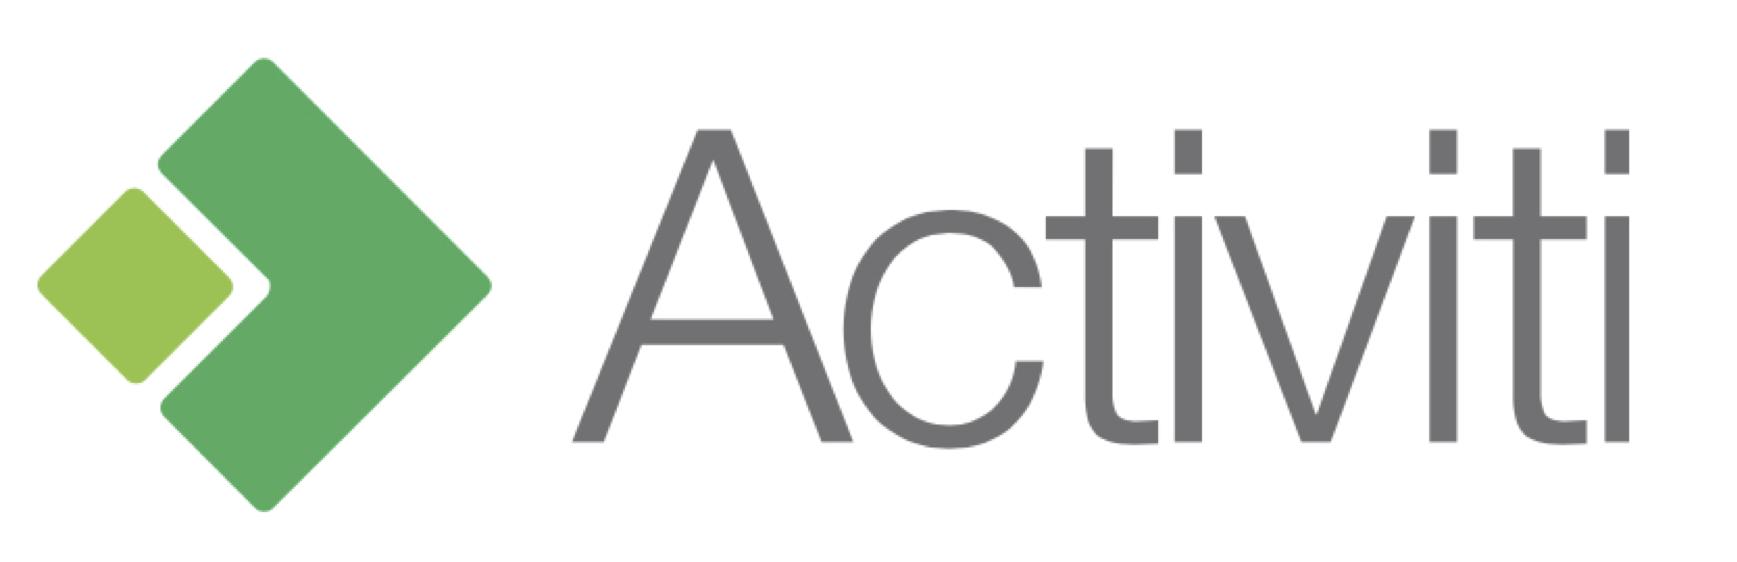 Activiti-logo